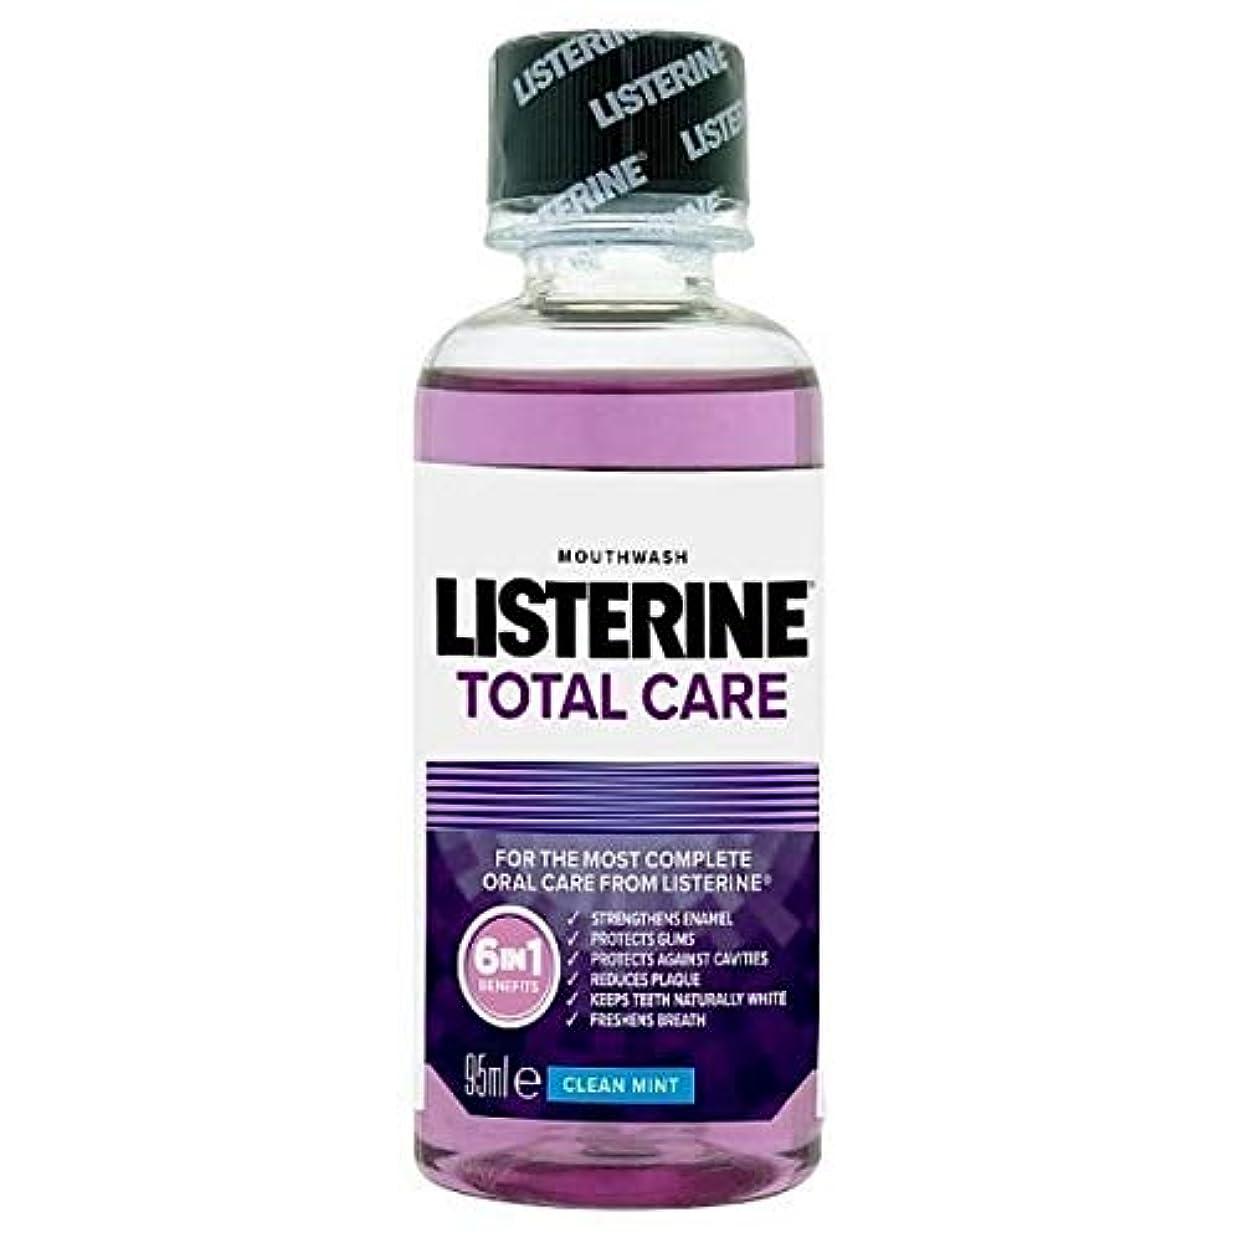 [Listerine ] リステリントータルケアトラベルマウスウォッシュクリーンミント95ミリリットル - Listerine Total Care Travel Mouthwash Clean Mint 95ml [並行輸入品]